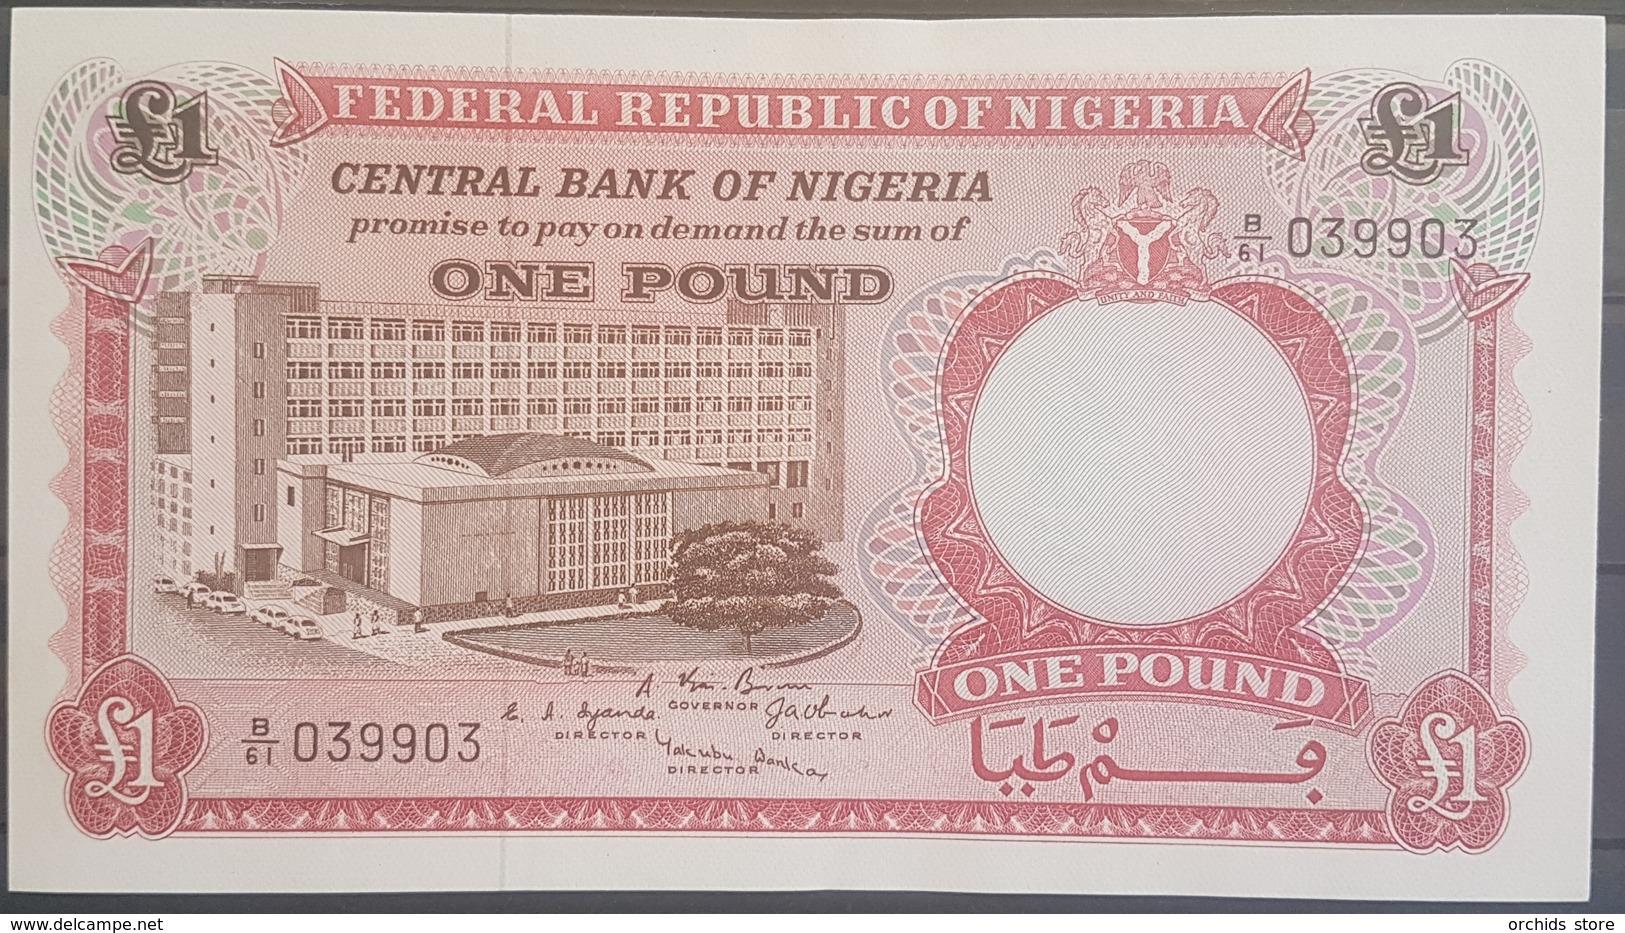 Nigeria UNC 1967 P.8 1 Pound Banknote #039903 Serial Number - Nigeria